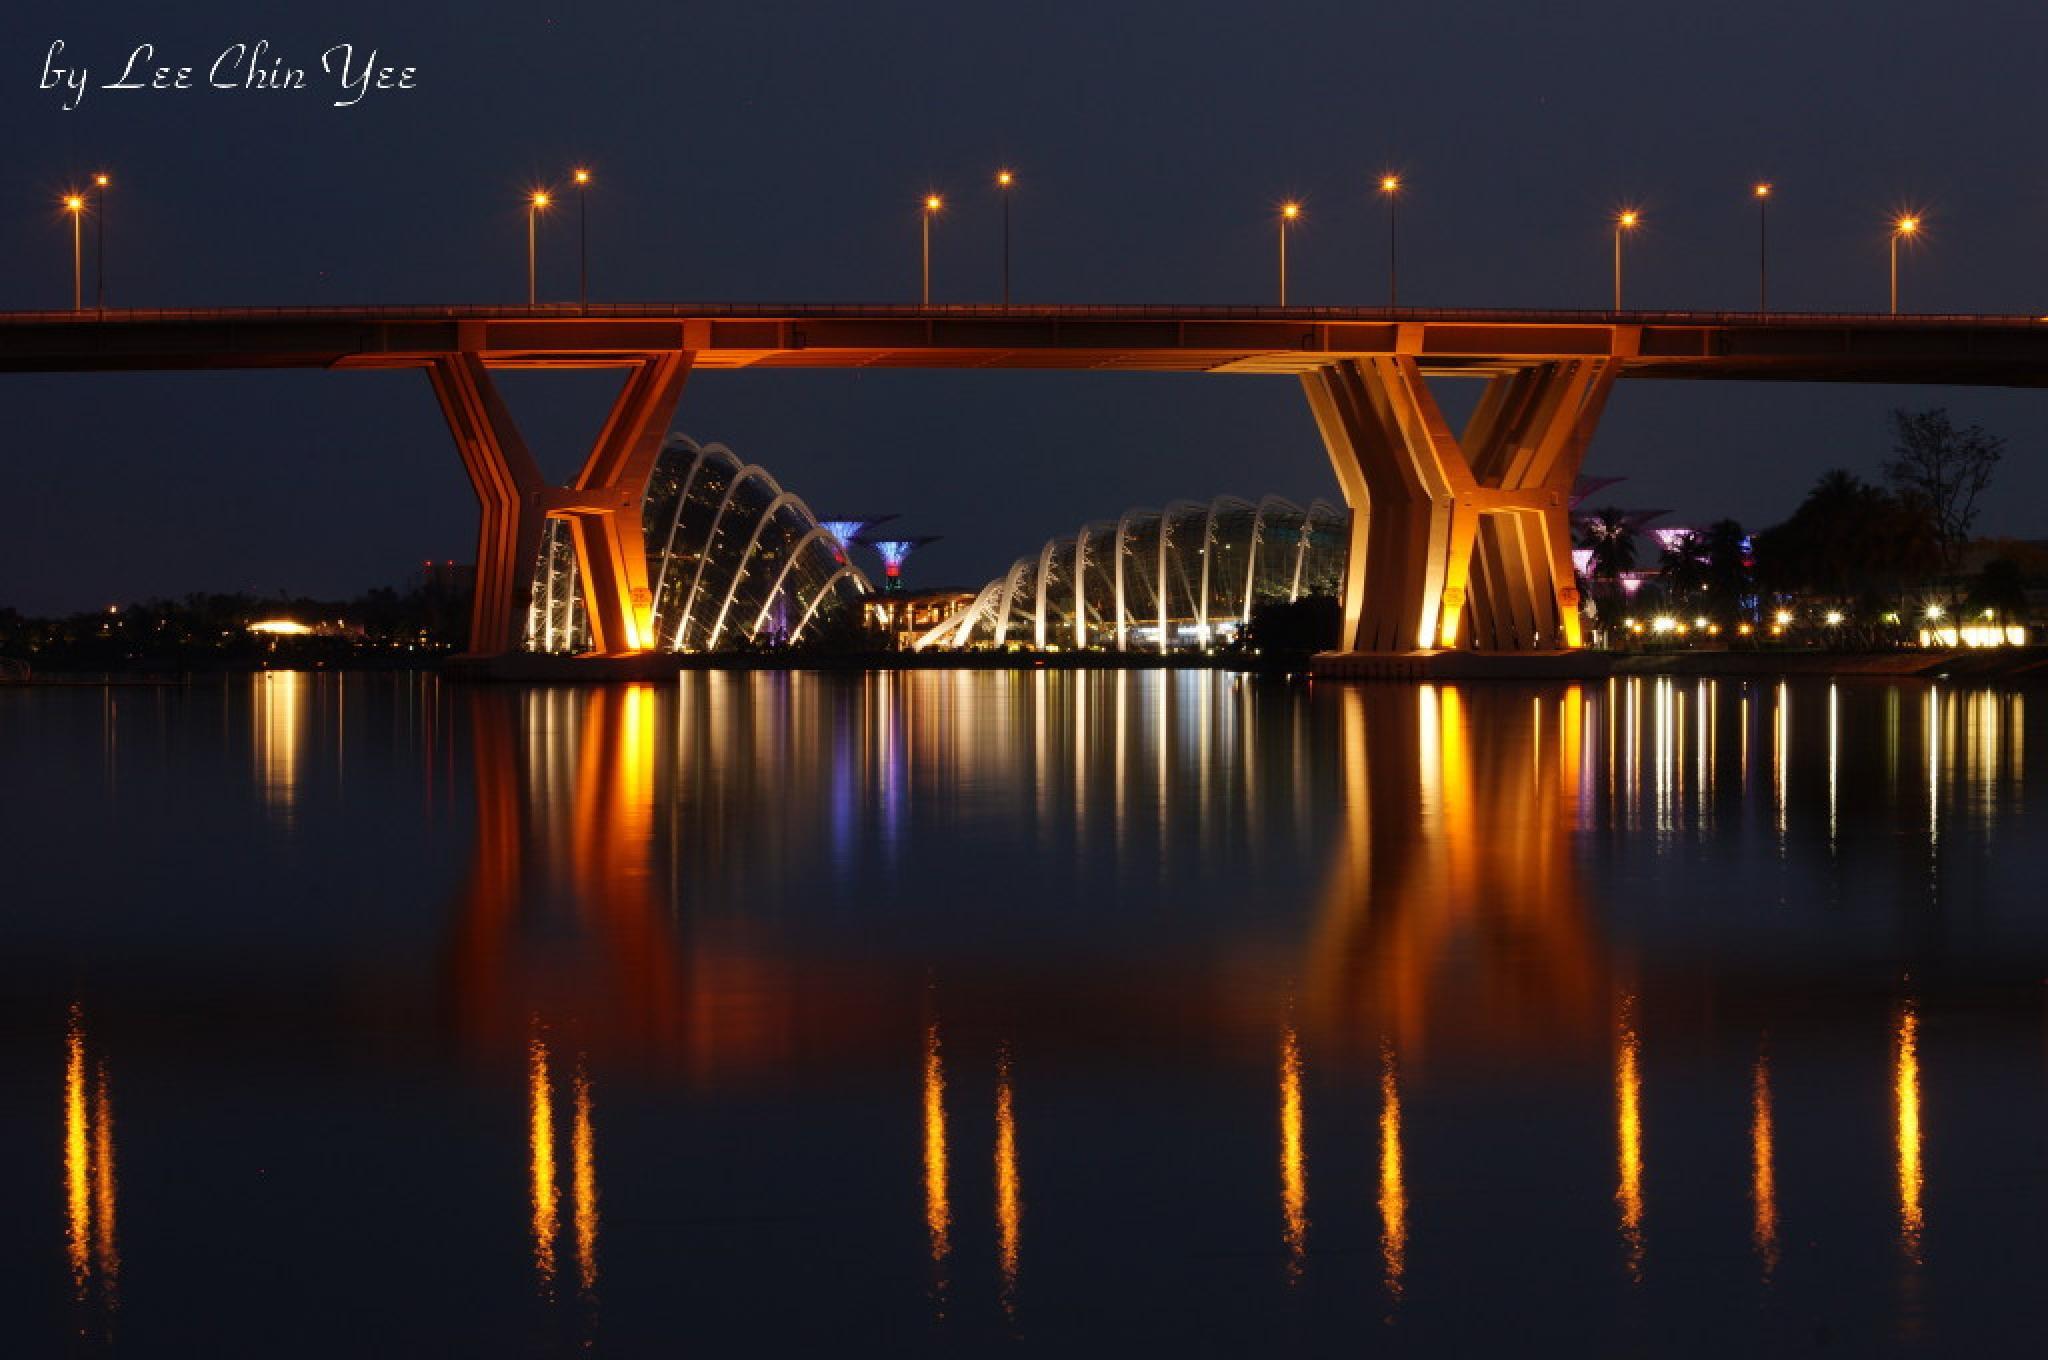 Marina Bay, Singapore by Chinyee